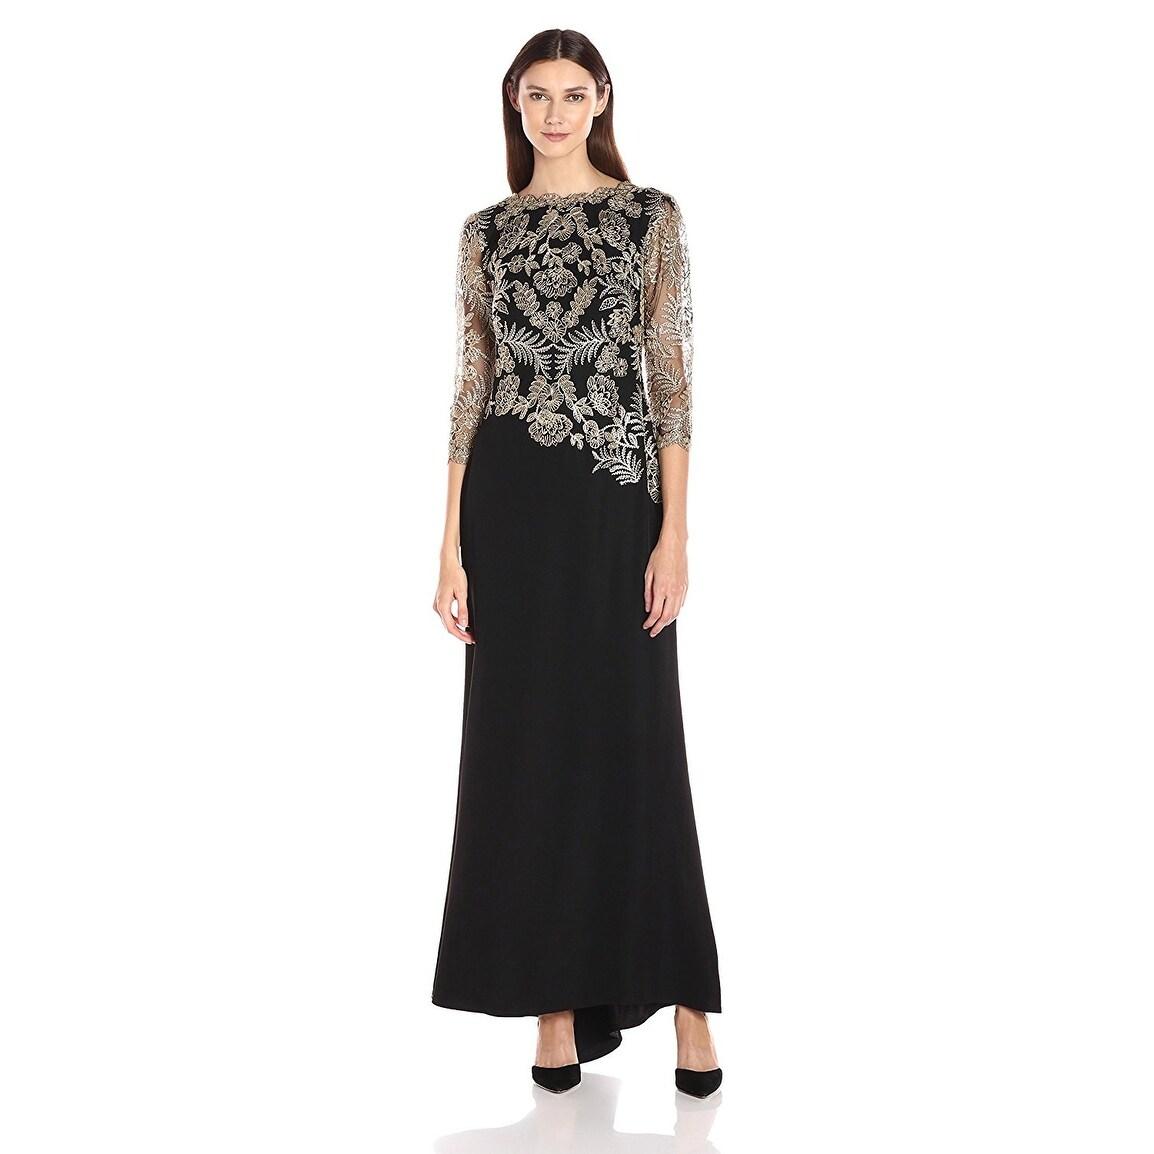 Tadashi Shoji Embroidered 3/4 Illusion Sleeve Evening Gown Dress - 4 ...